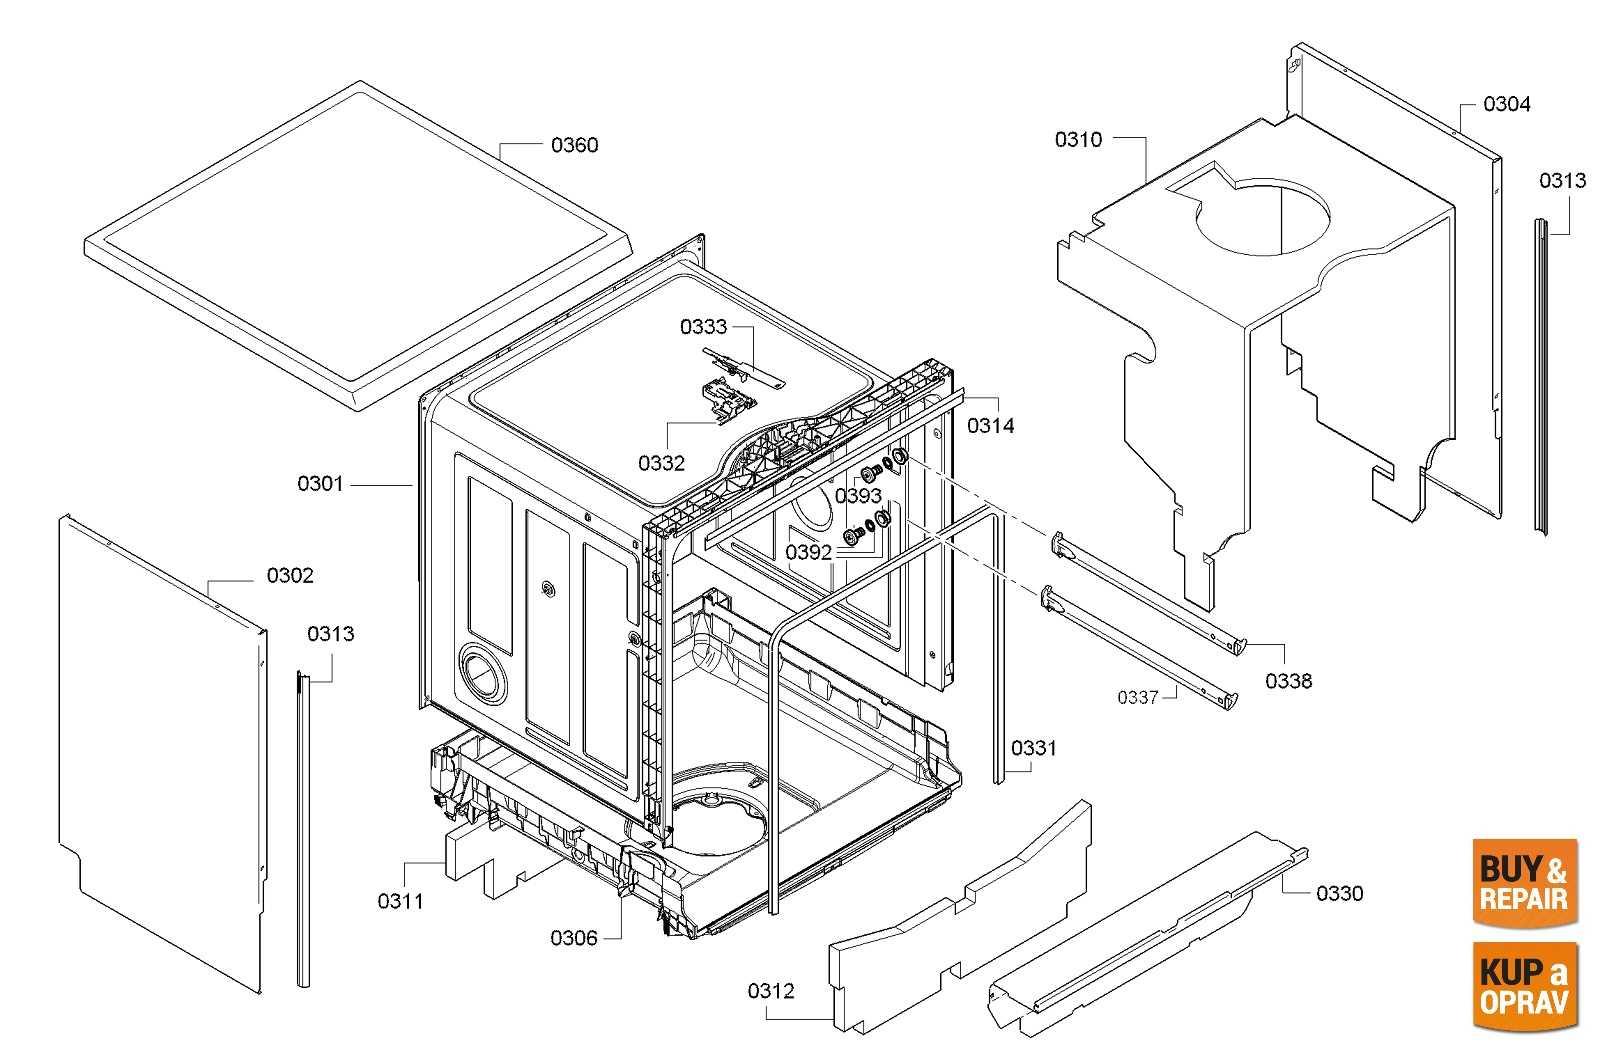 Dishwasher Spare Parts & Accessories